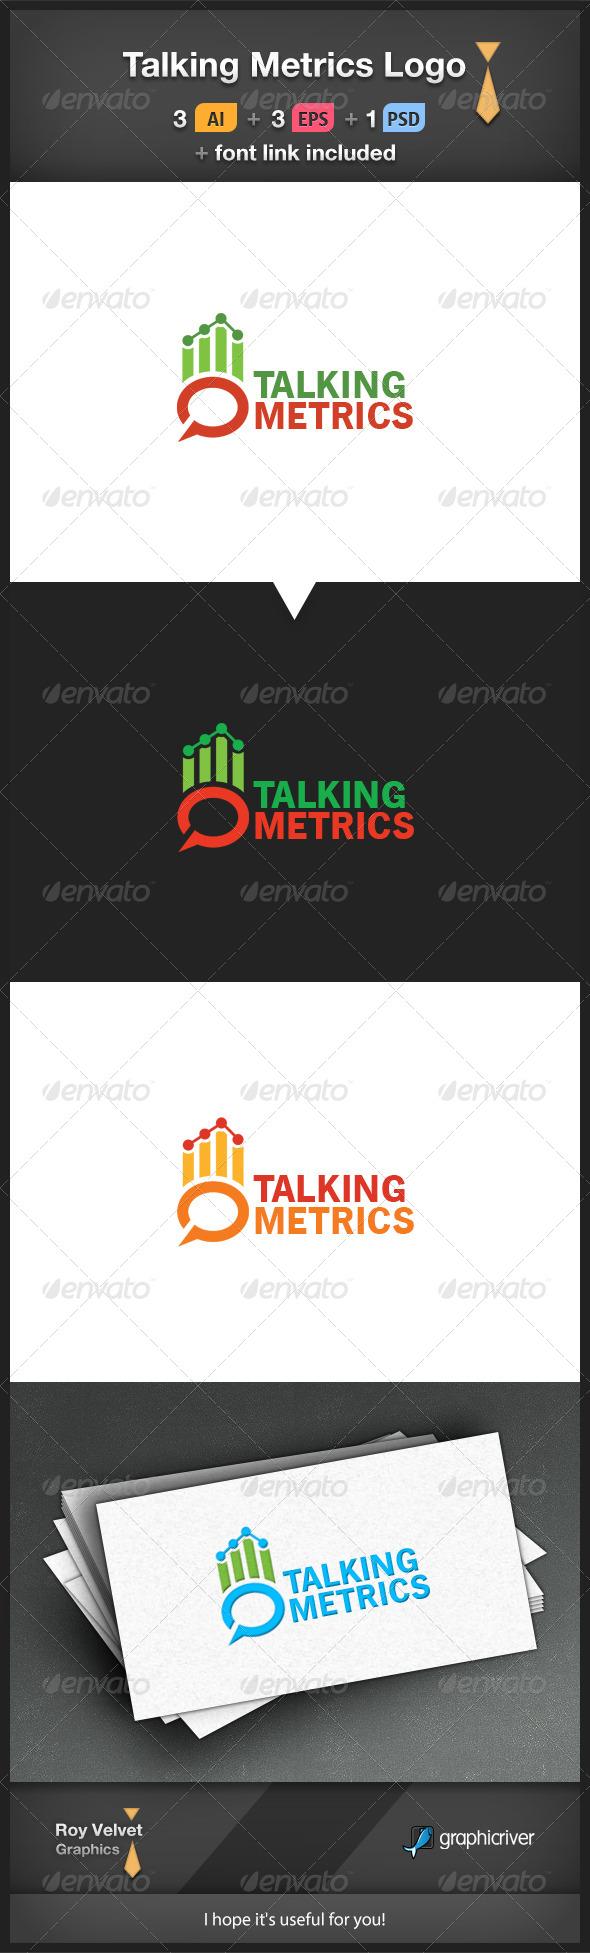 GraphicRiver Talking Metrics Logo 6270335